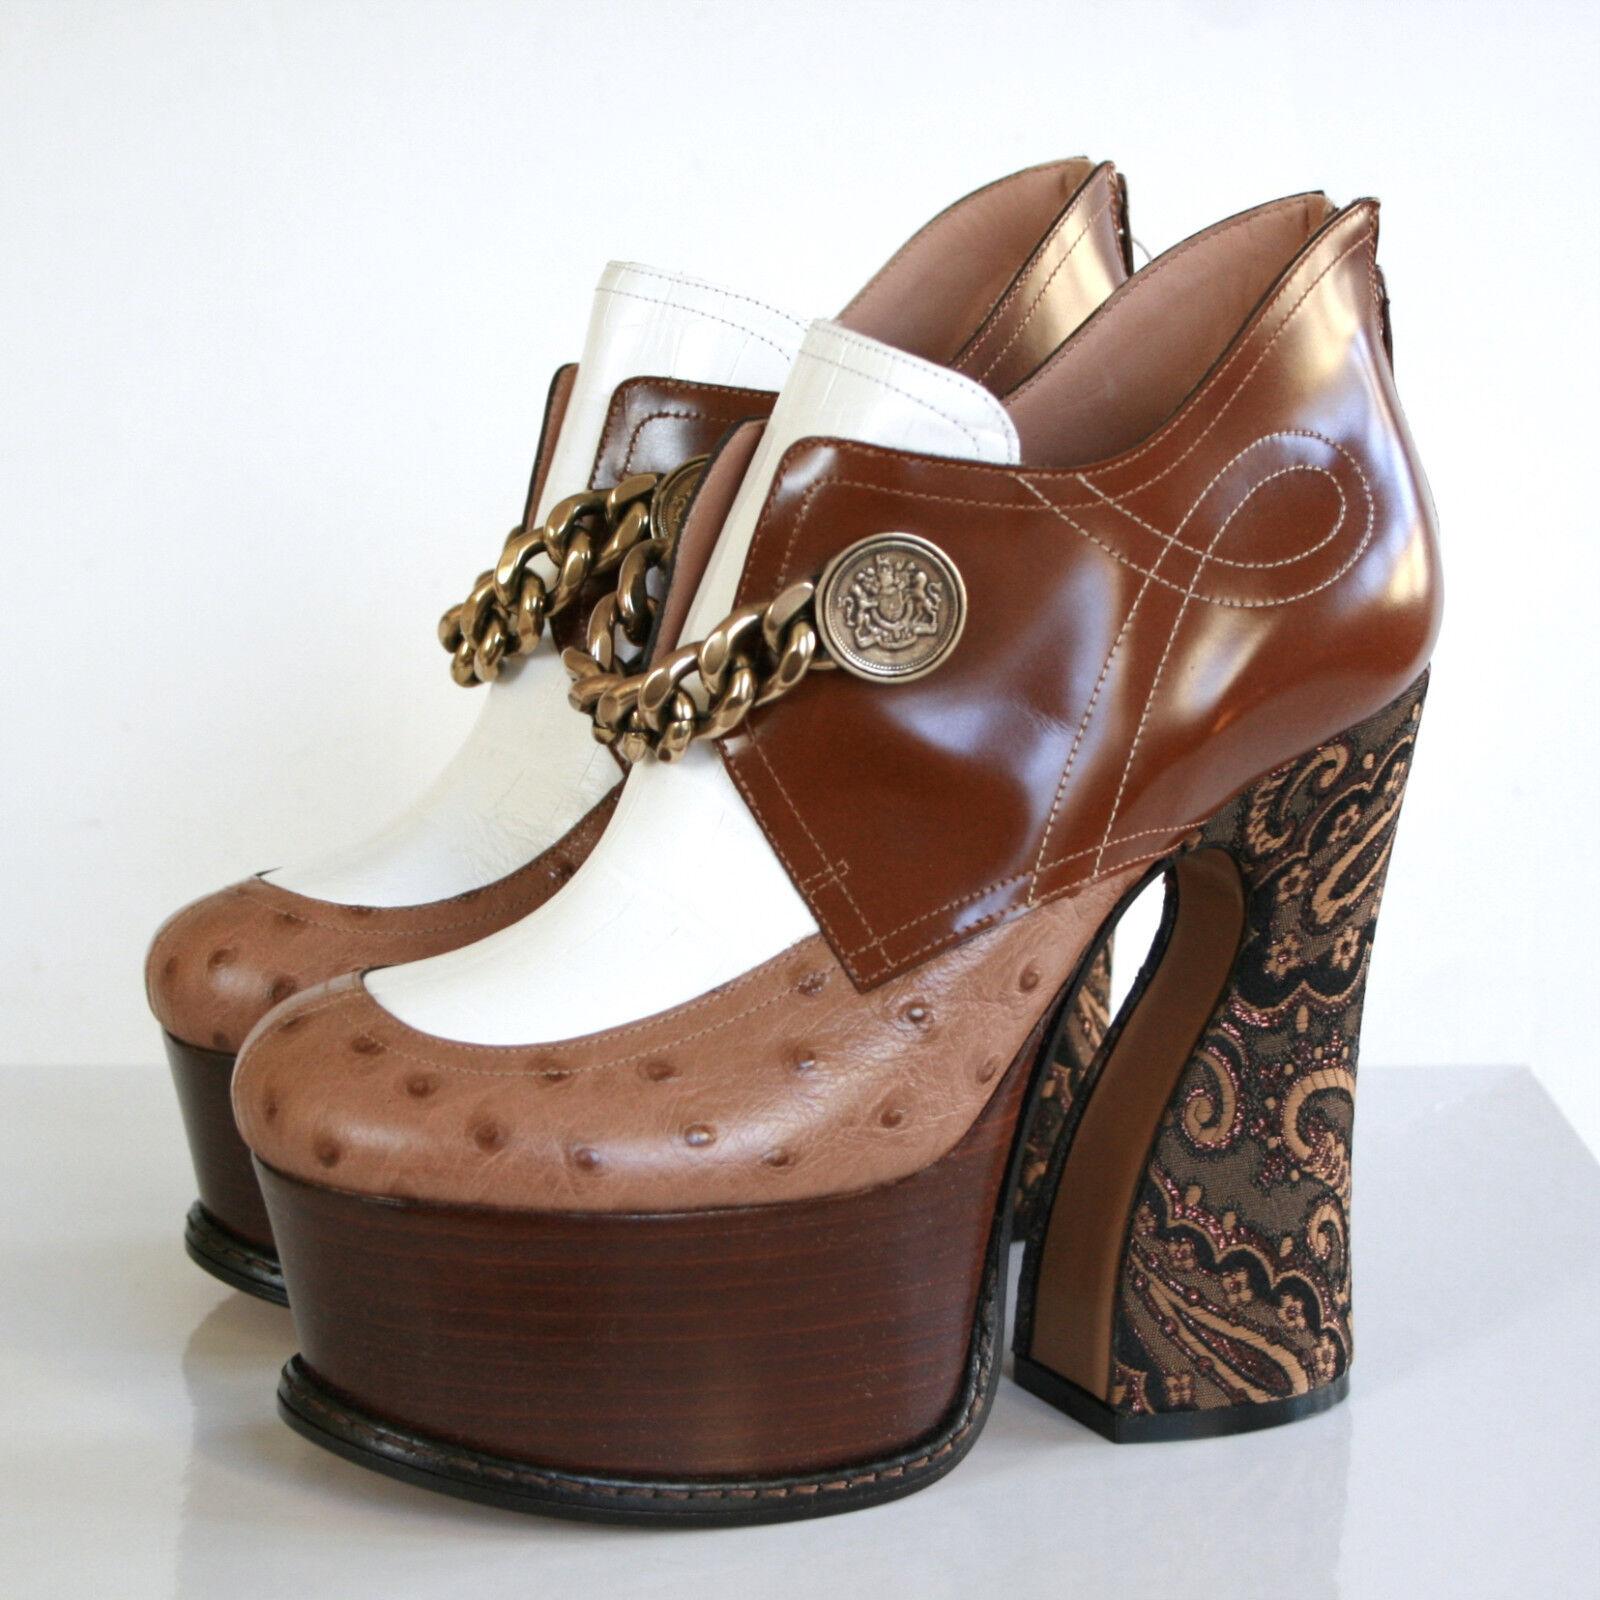 negozio fa acquisti e vendite MAISON MARTIN MARGIELA sculpted sculpted sculpted high heel platform ostrich chain scarpe 37 NEW  vendita economica